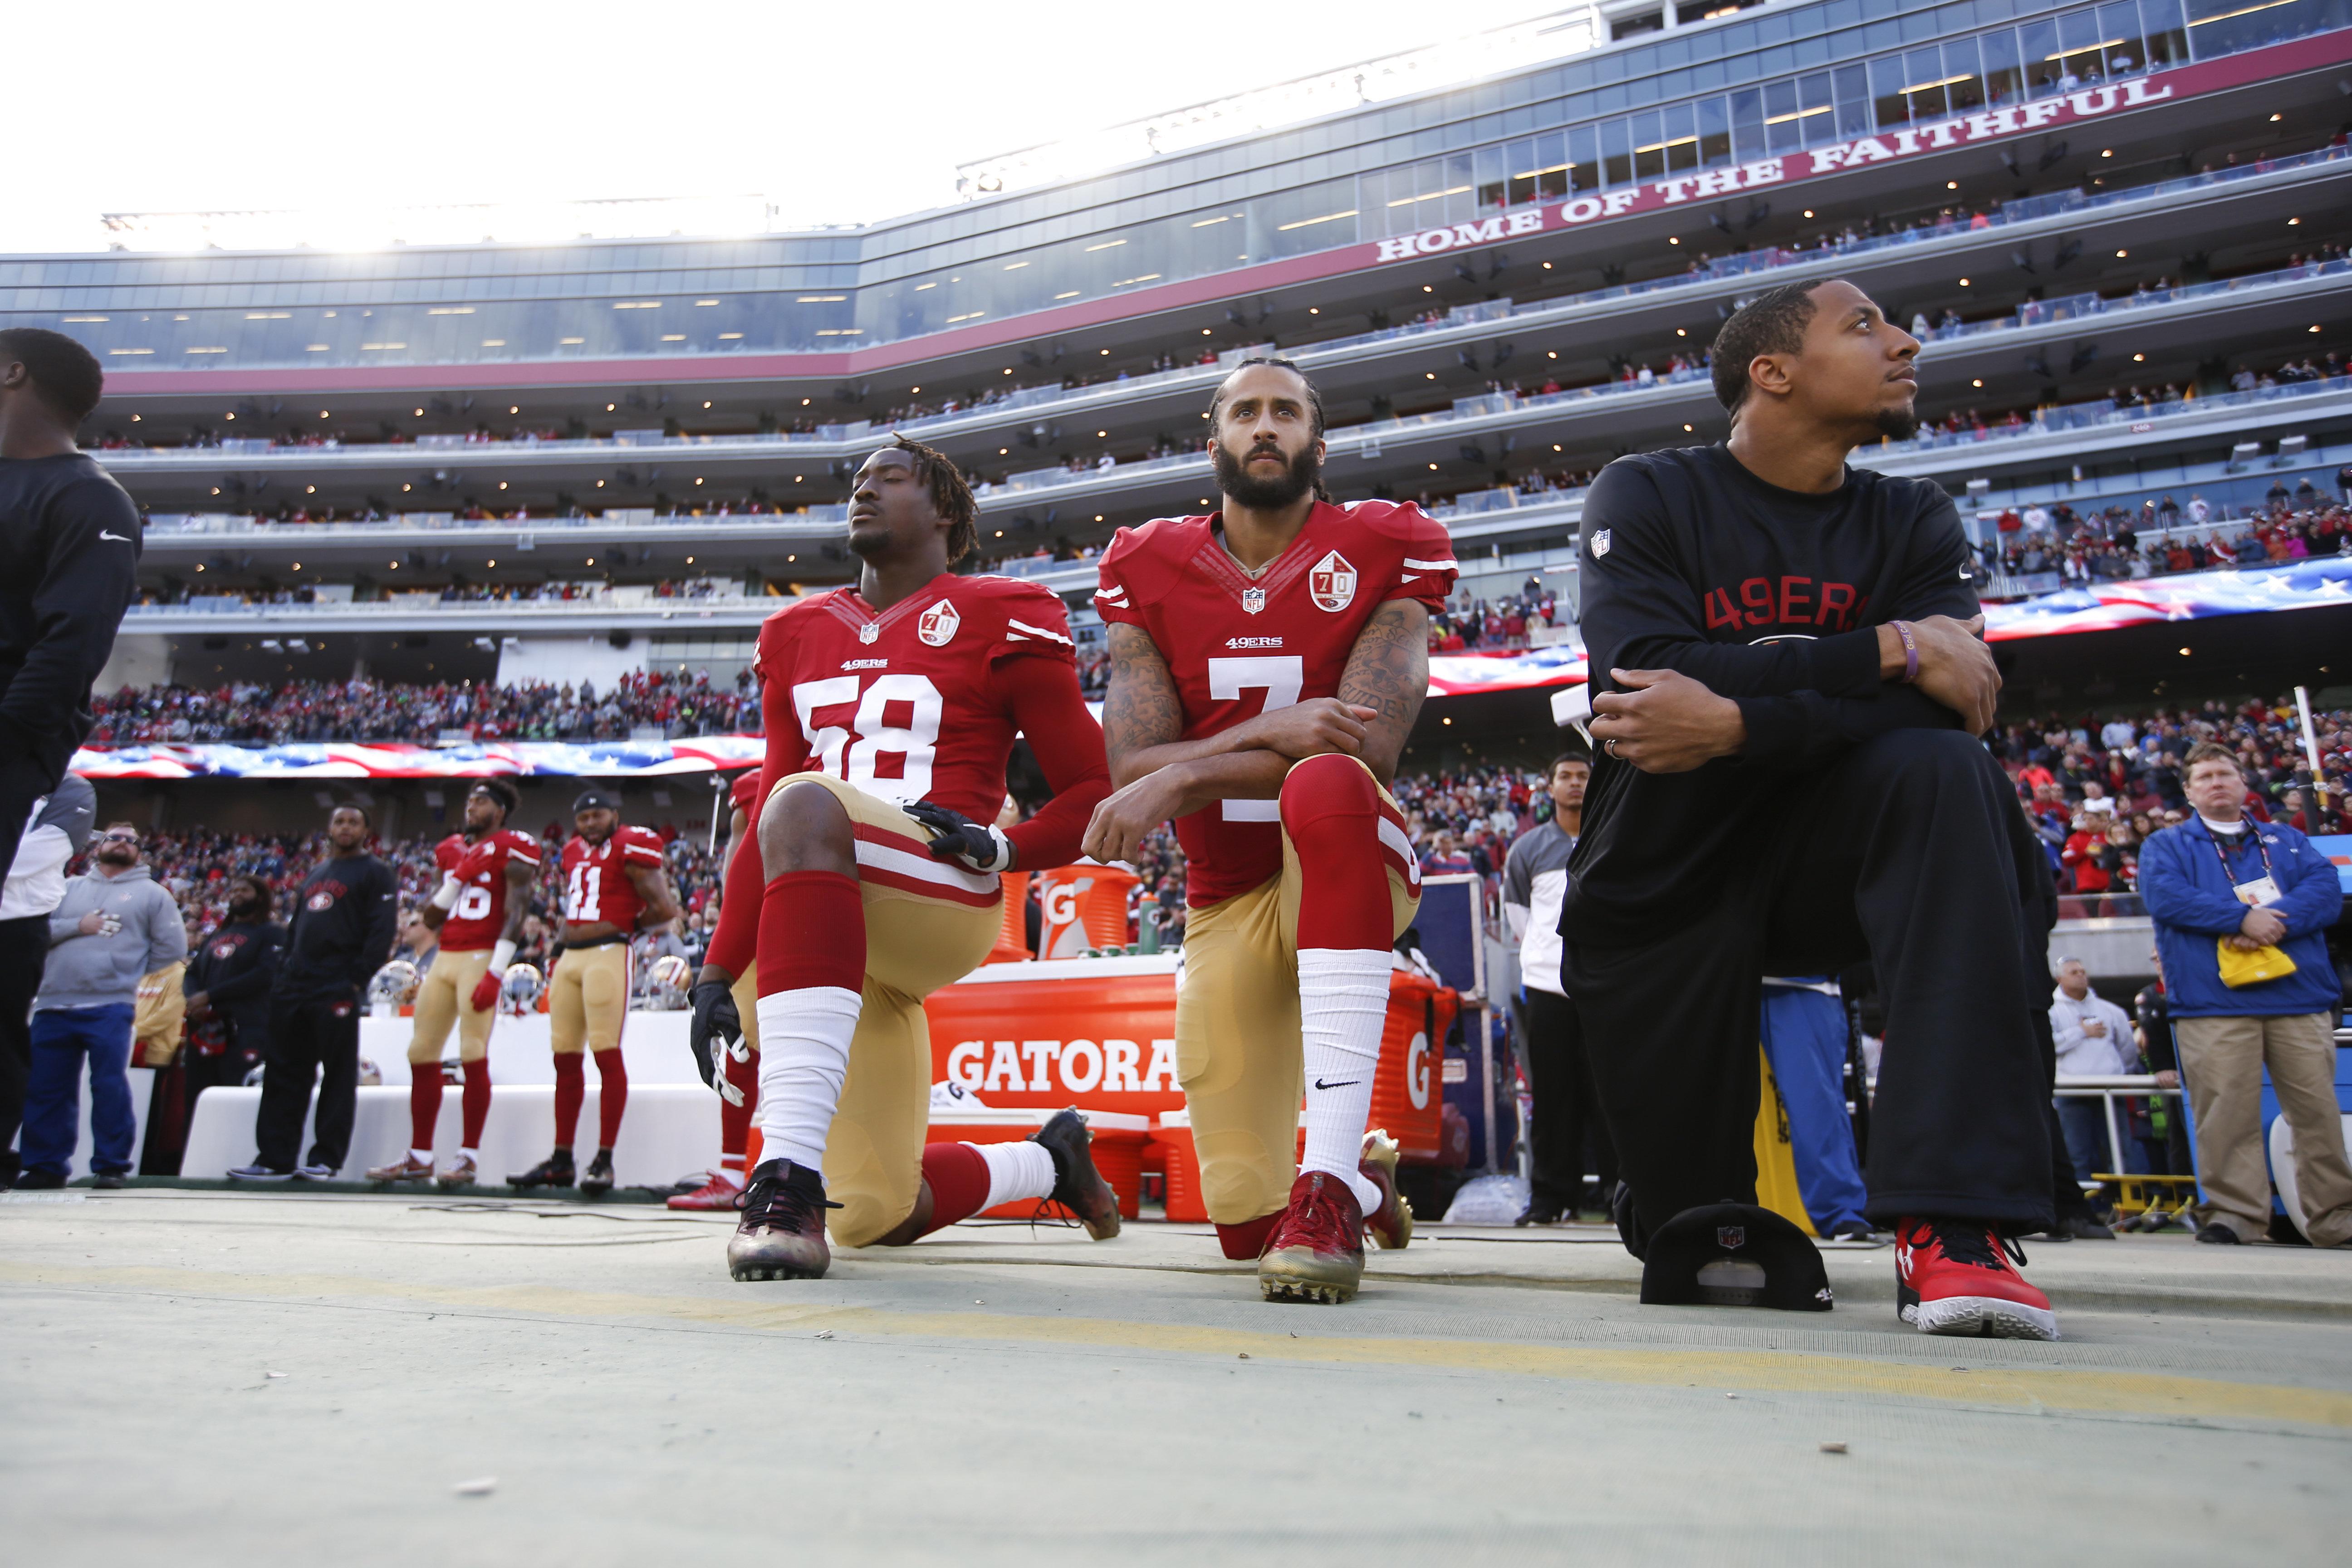 NFL이 '무릎 꿇기 시위'를